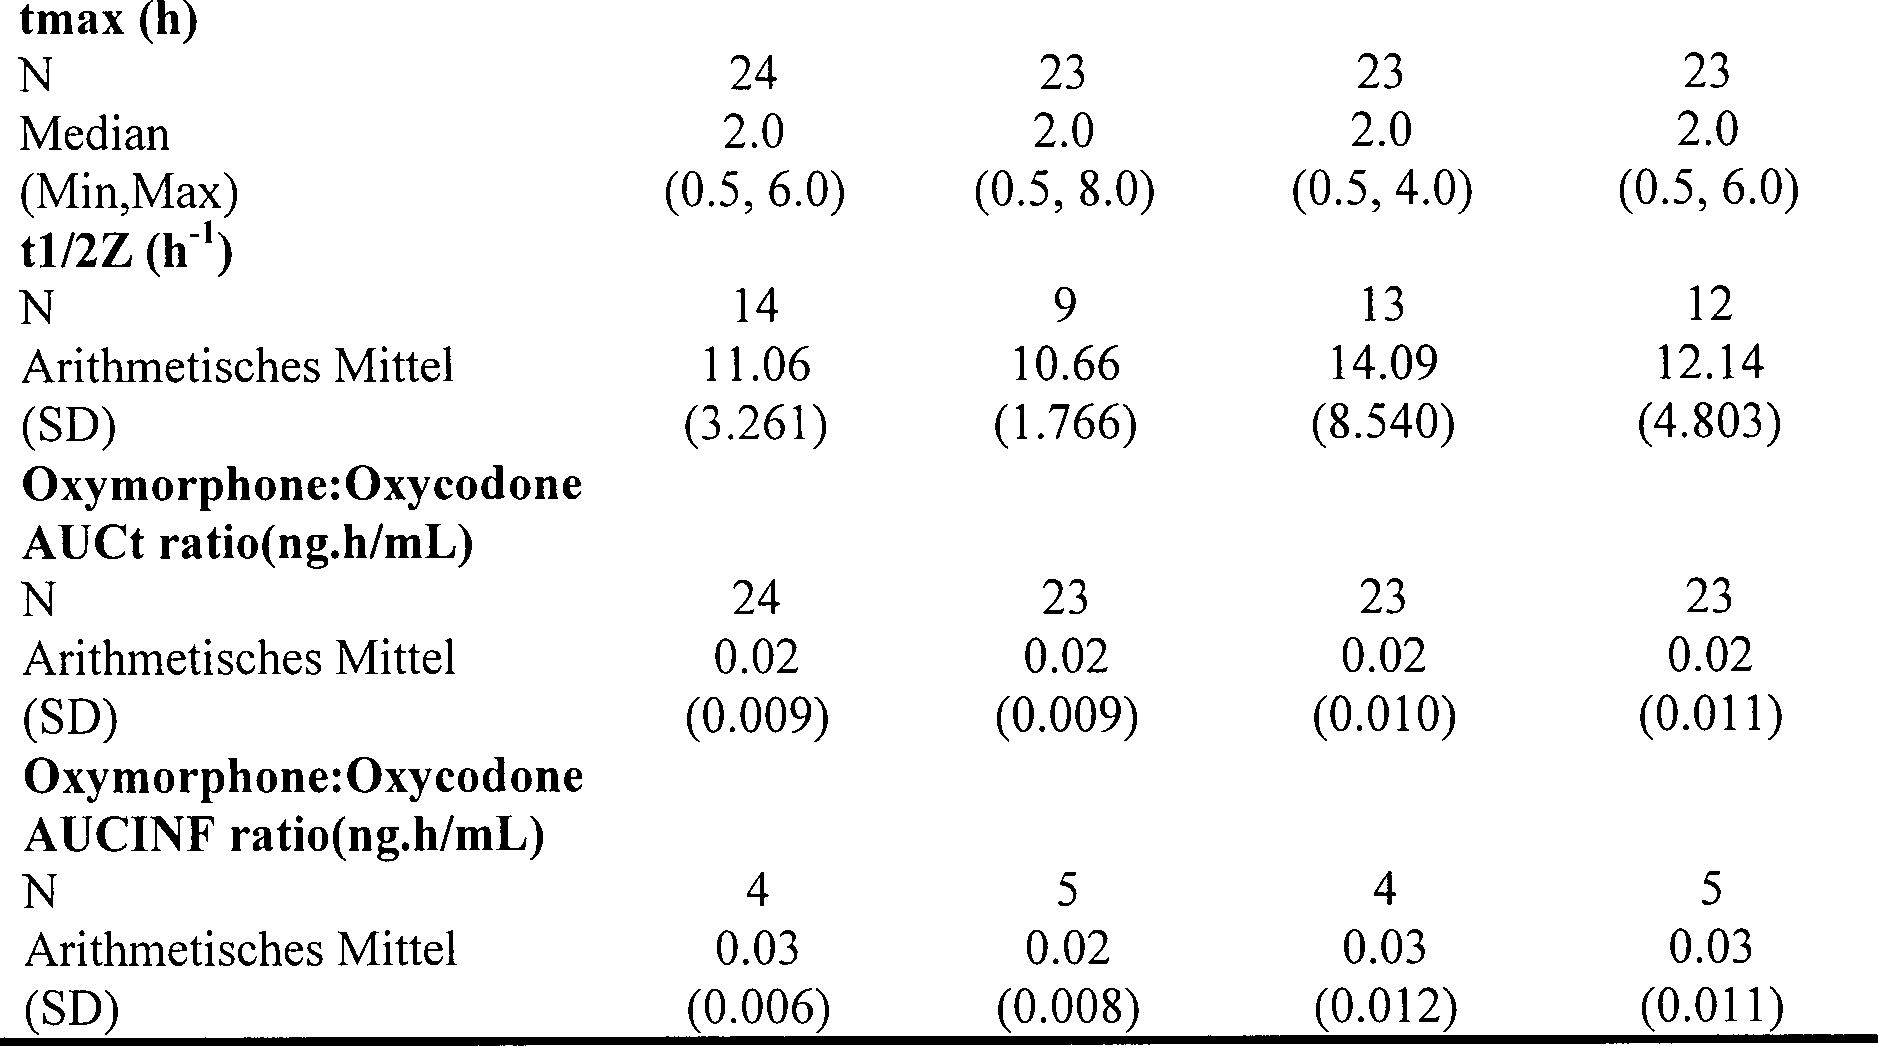 DE202006020095U1 - Dosierform enthaltend Oxycodon und Naloxon ...